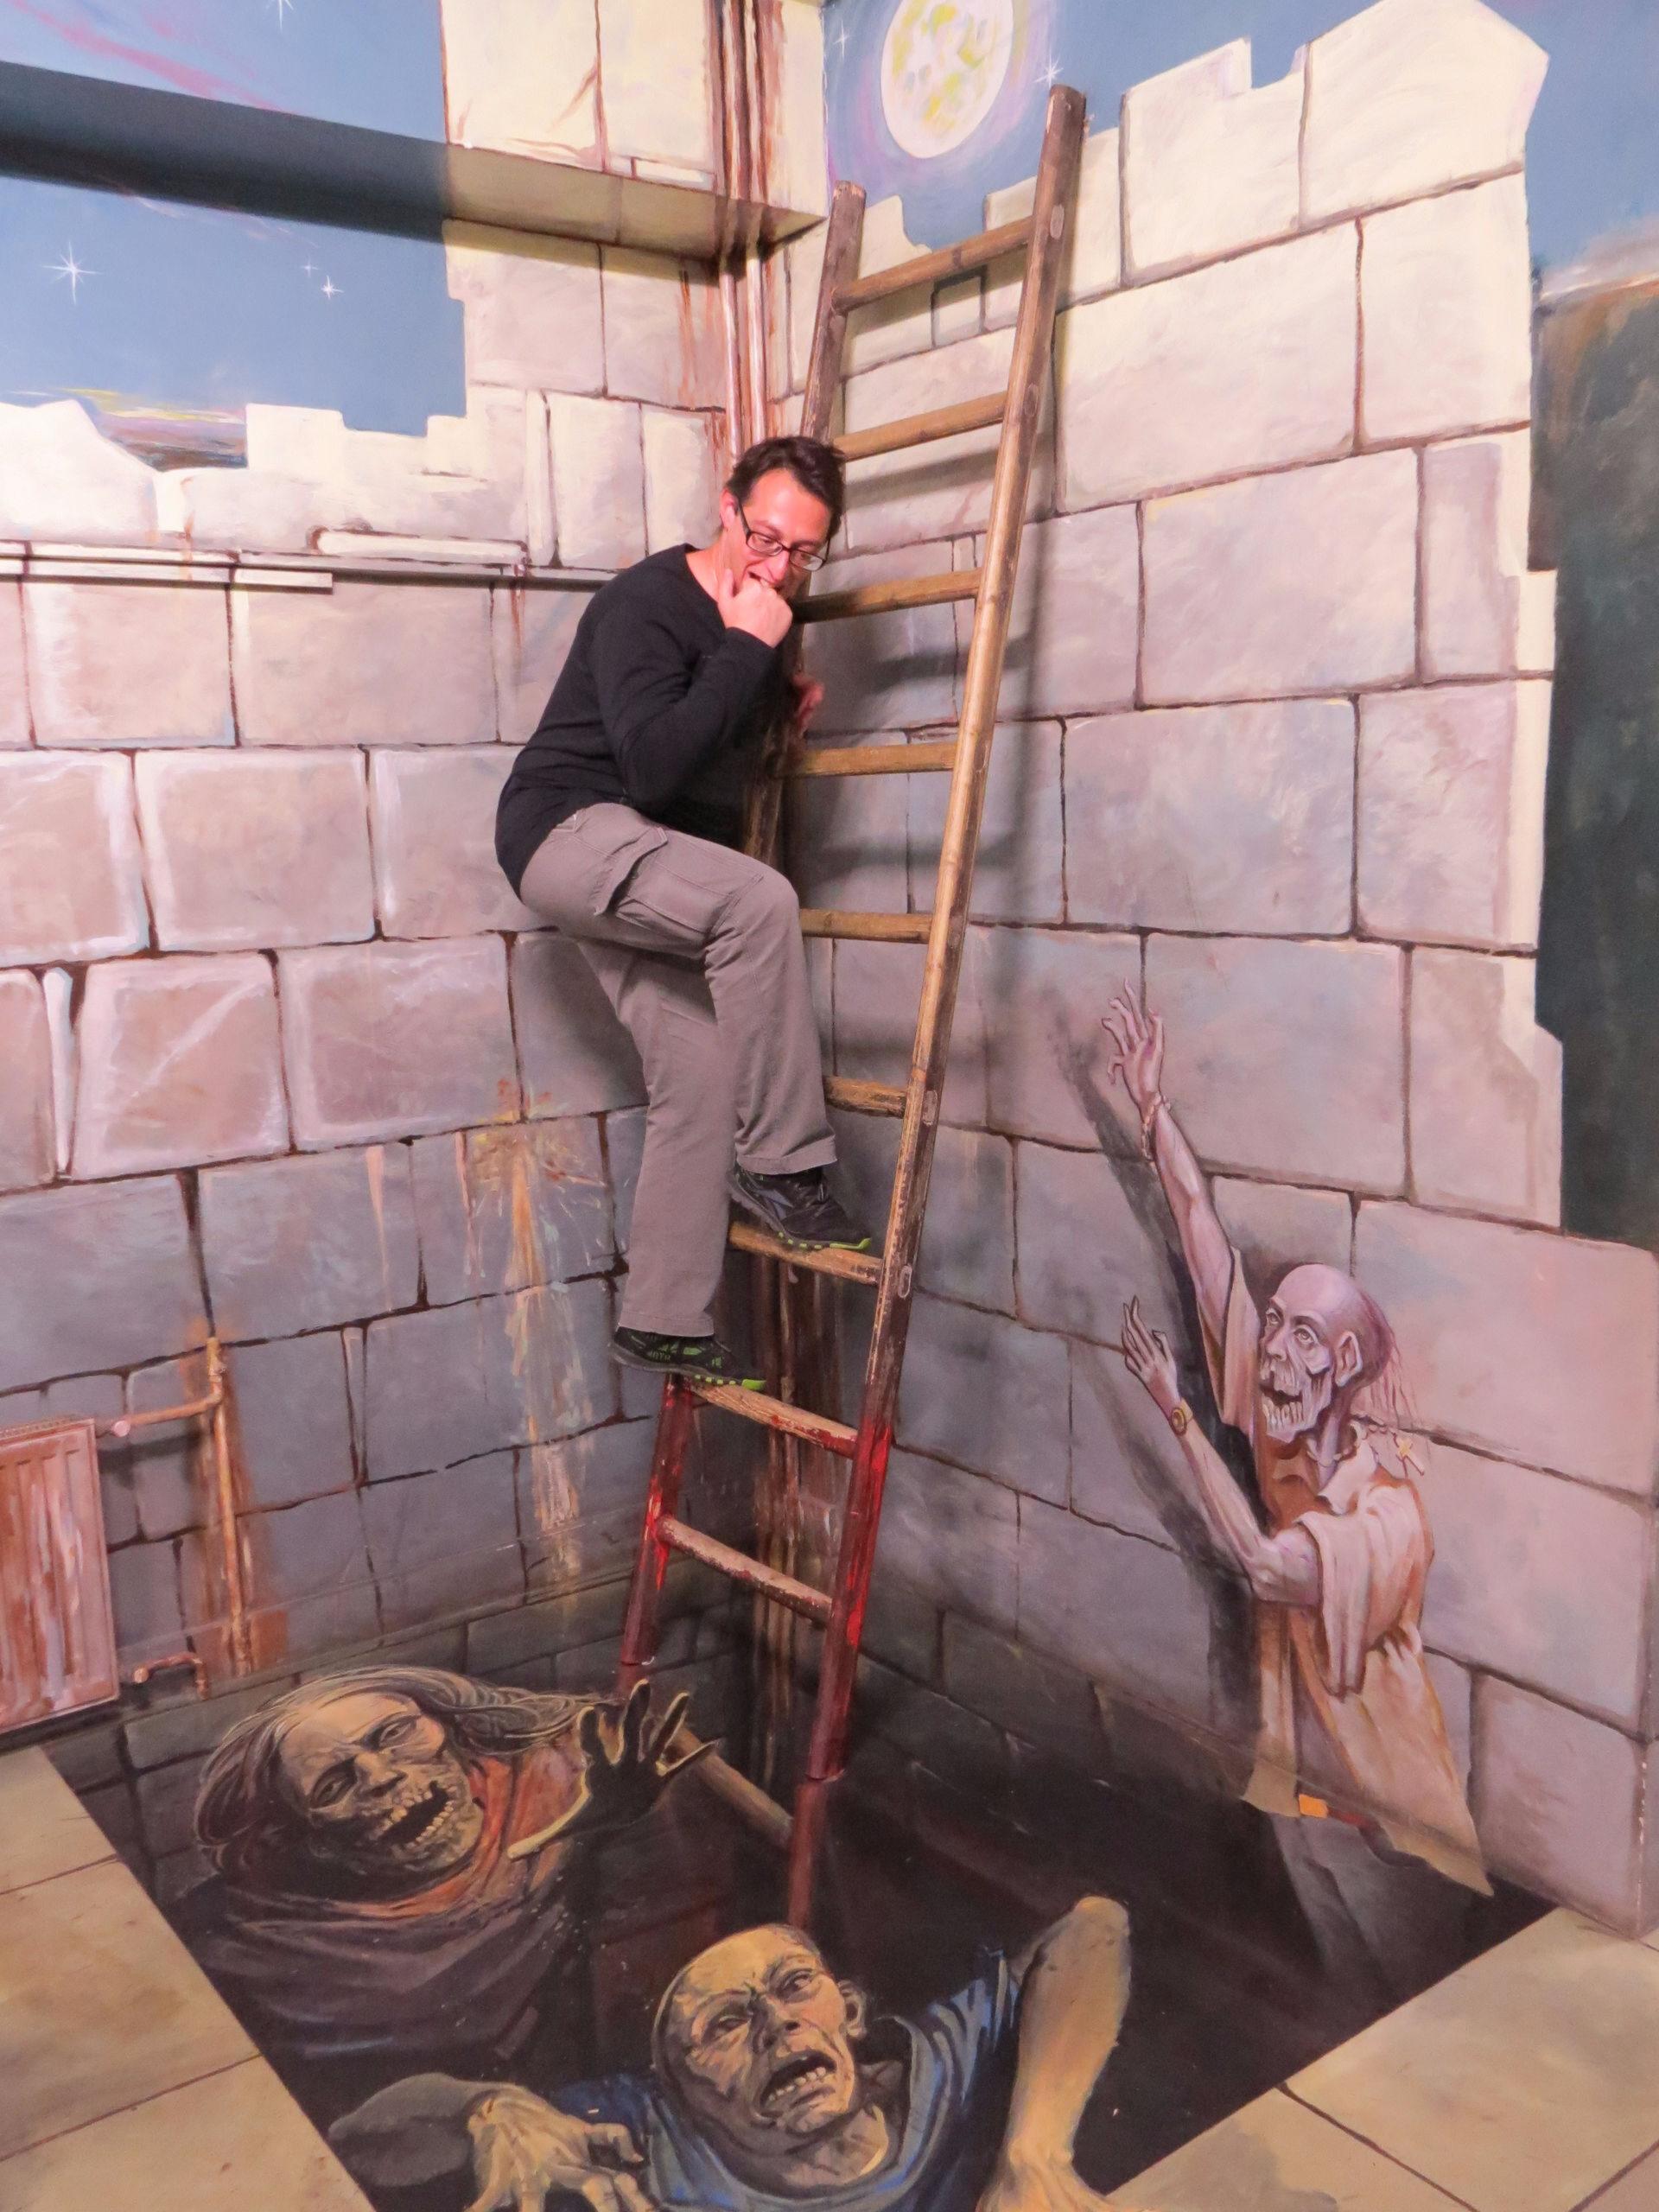 Музей иллюзий идругие развлекушки наСтаром Арбате